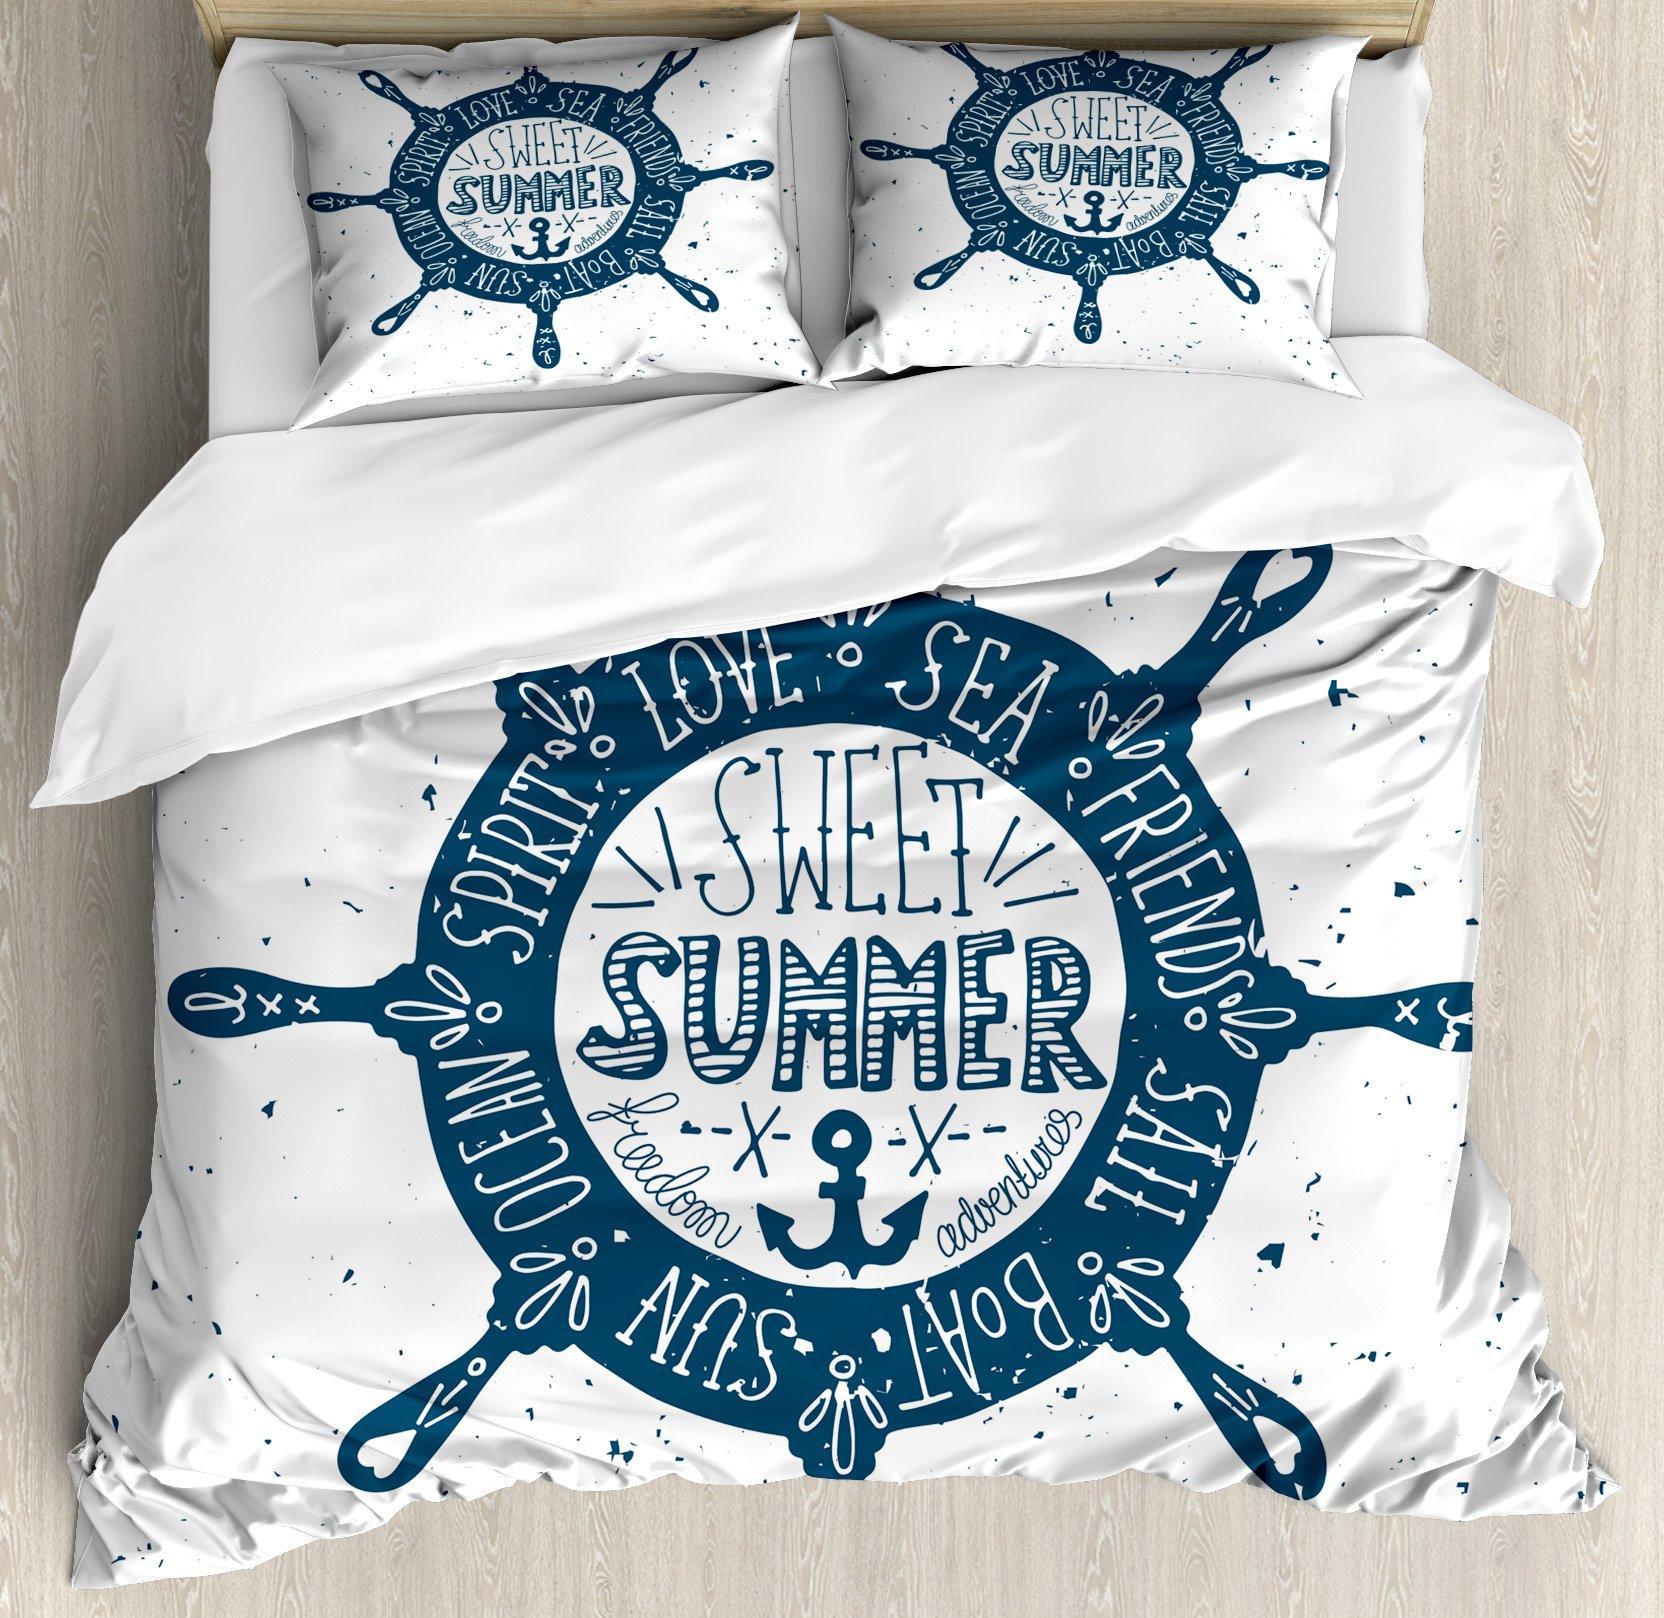 Lunarable Nautical Queen Size Duvet Cover Set, Sweet Summer Message inside Steering Wheel Love Sea Friend Sail Spirit, Decorative 3 Piece Bedding Set with 2 Pillow Shams, Dark Blue and White